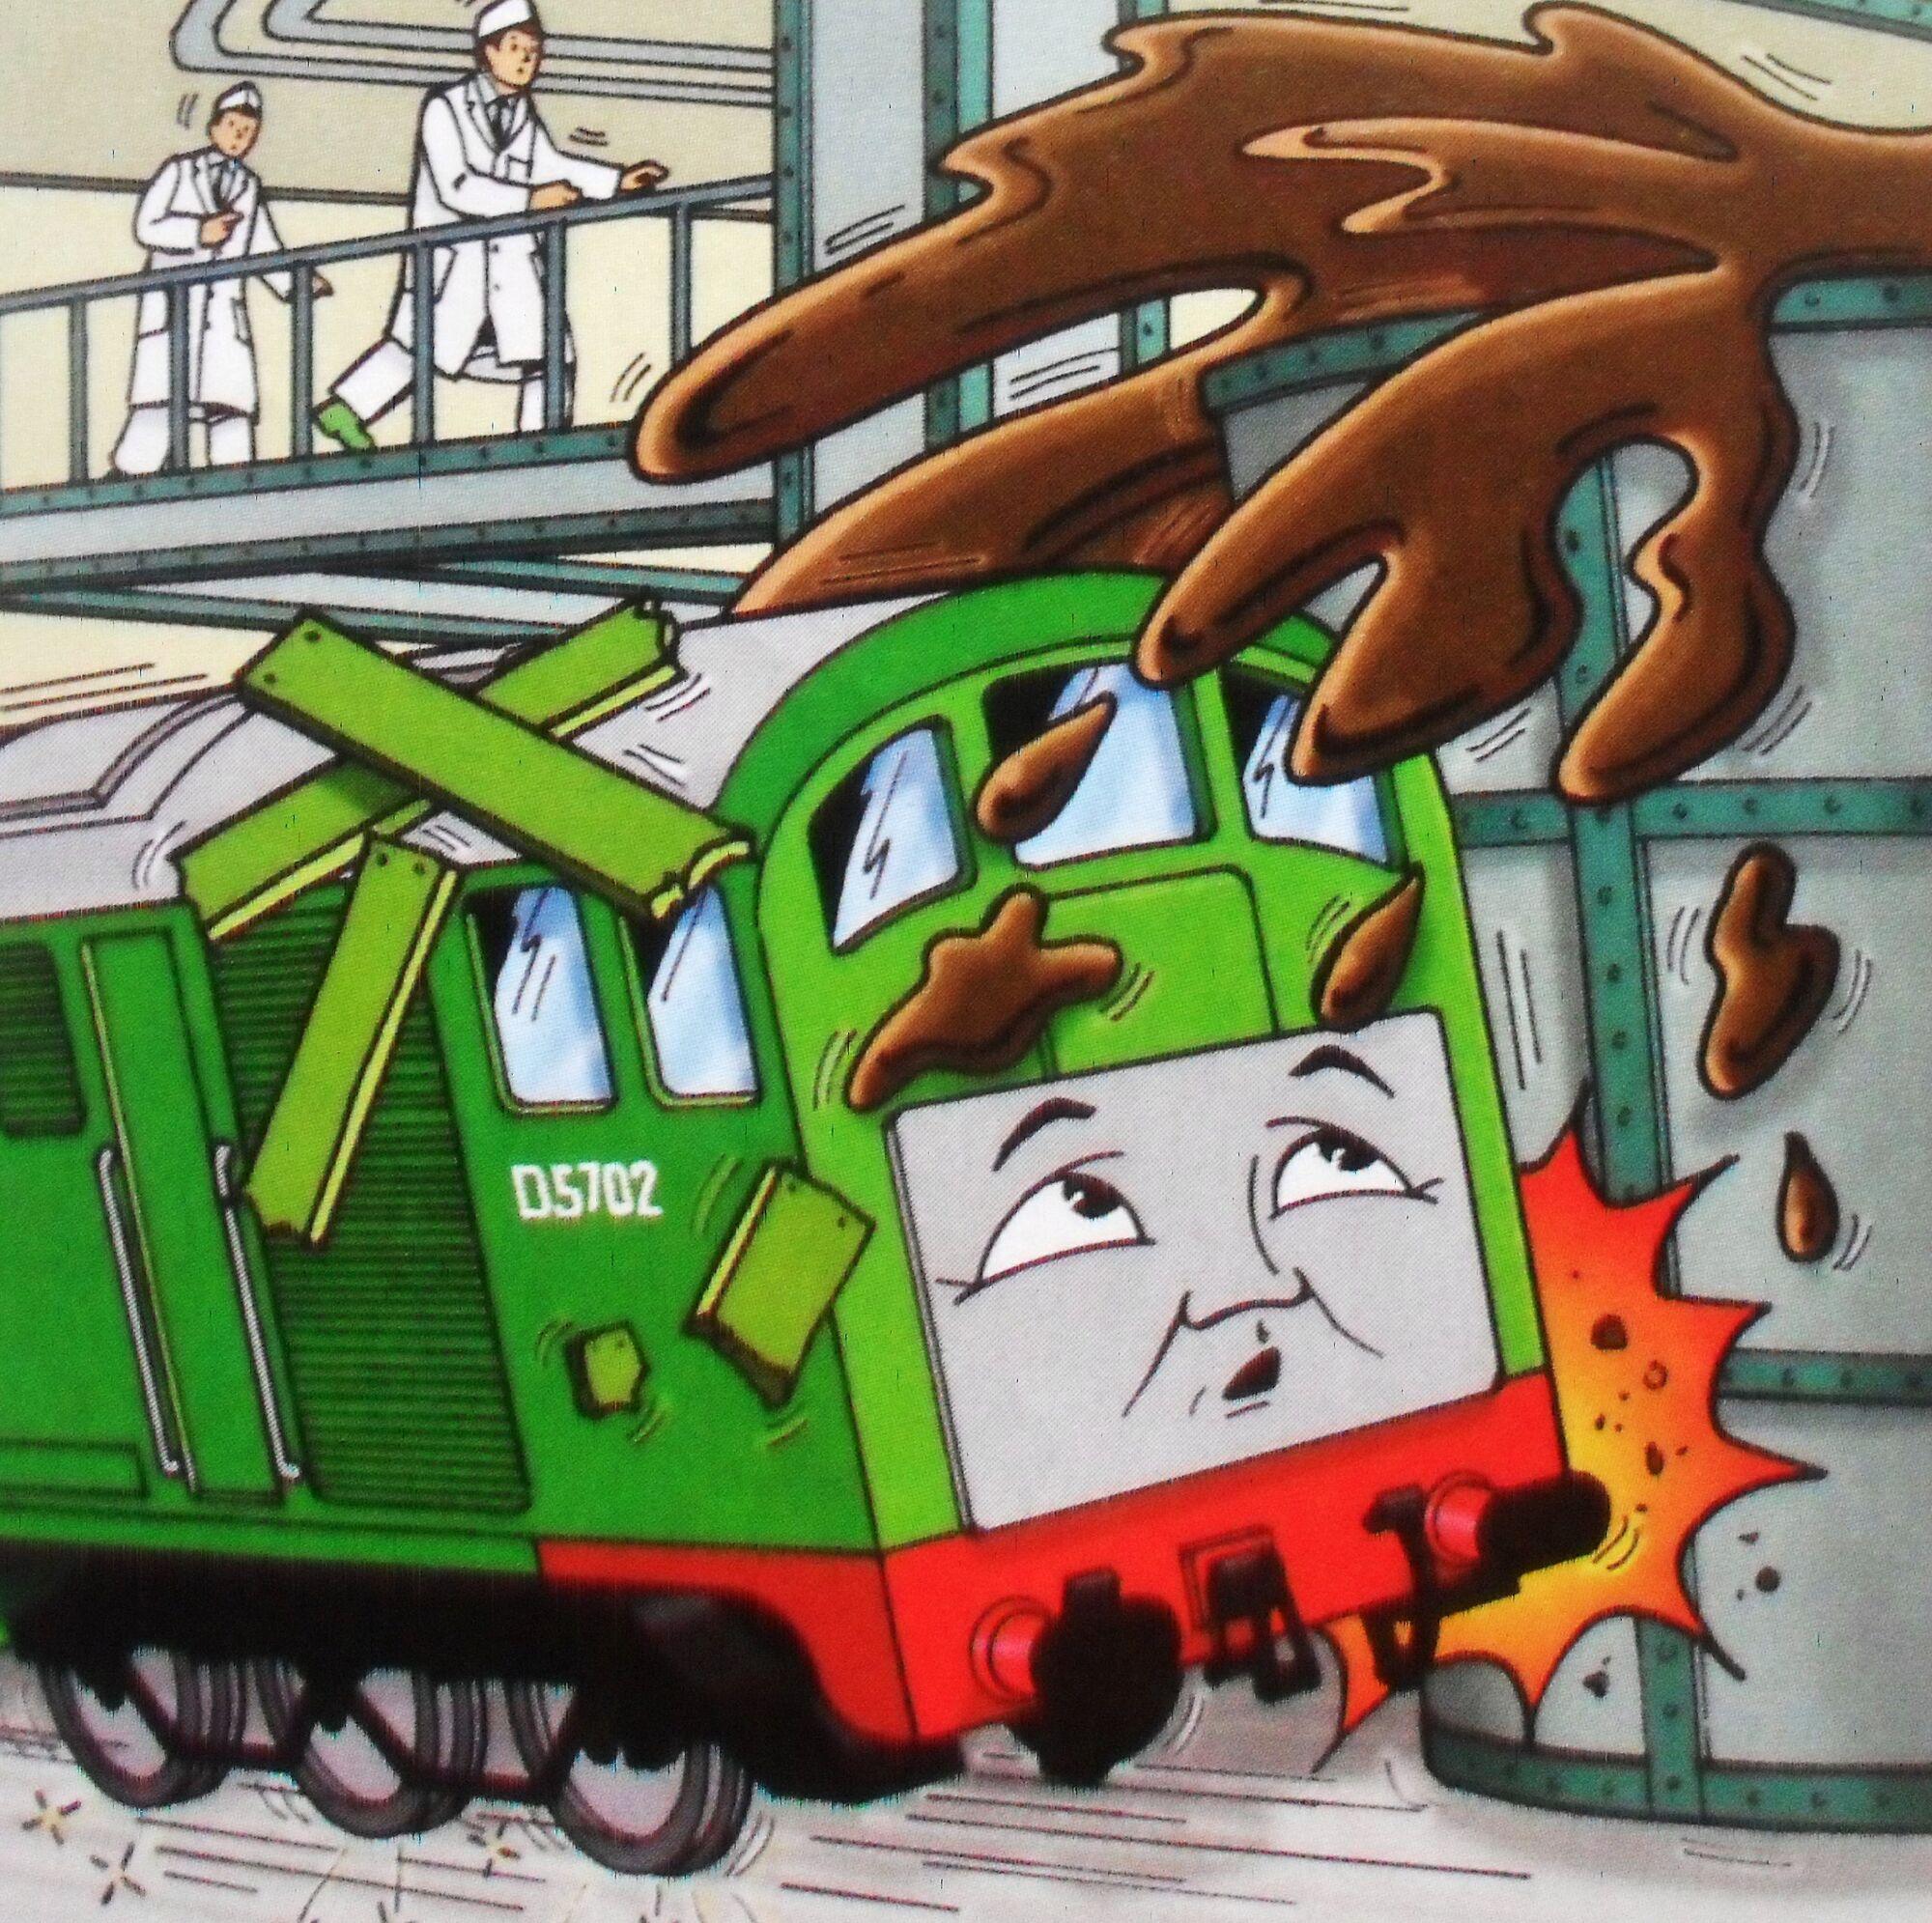 Image boco in trainz thomas and friends png scratchpad fandom - Choc O Boco Thomas The Tank Engine Wikia Fandom